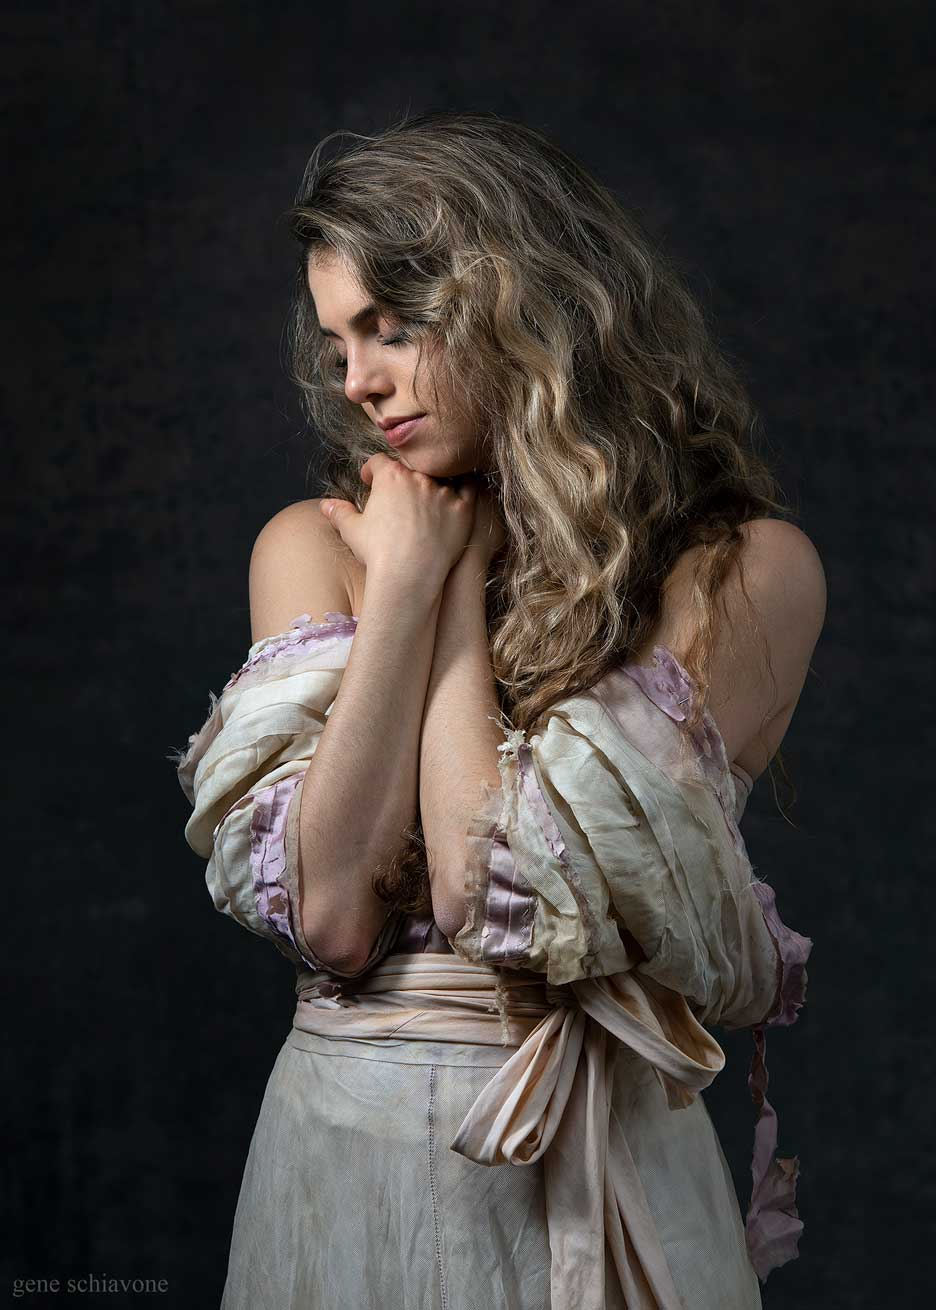 Portrait Photography By Gene Schiavone, Naples FL